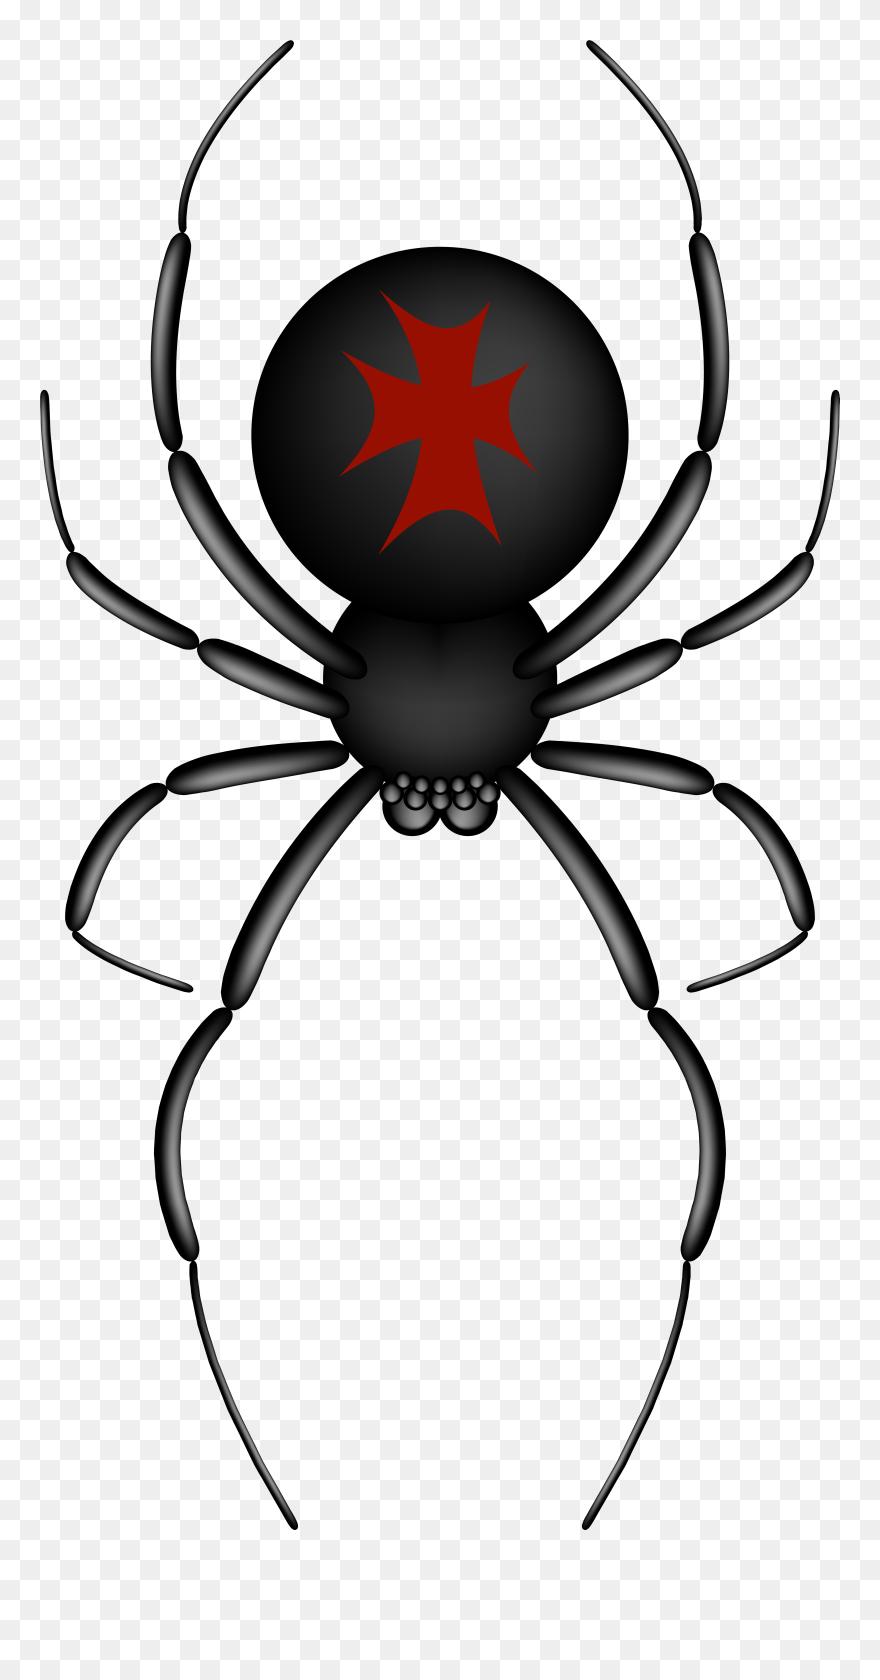 Download Hd Insects Spiders Spider Web Clip Art Cartoon Transparent Background Cartoon Clip Art Spider Png Download And Use Cartoon Clip Art Clip Art Art